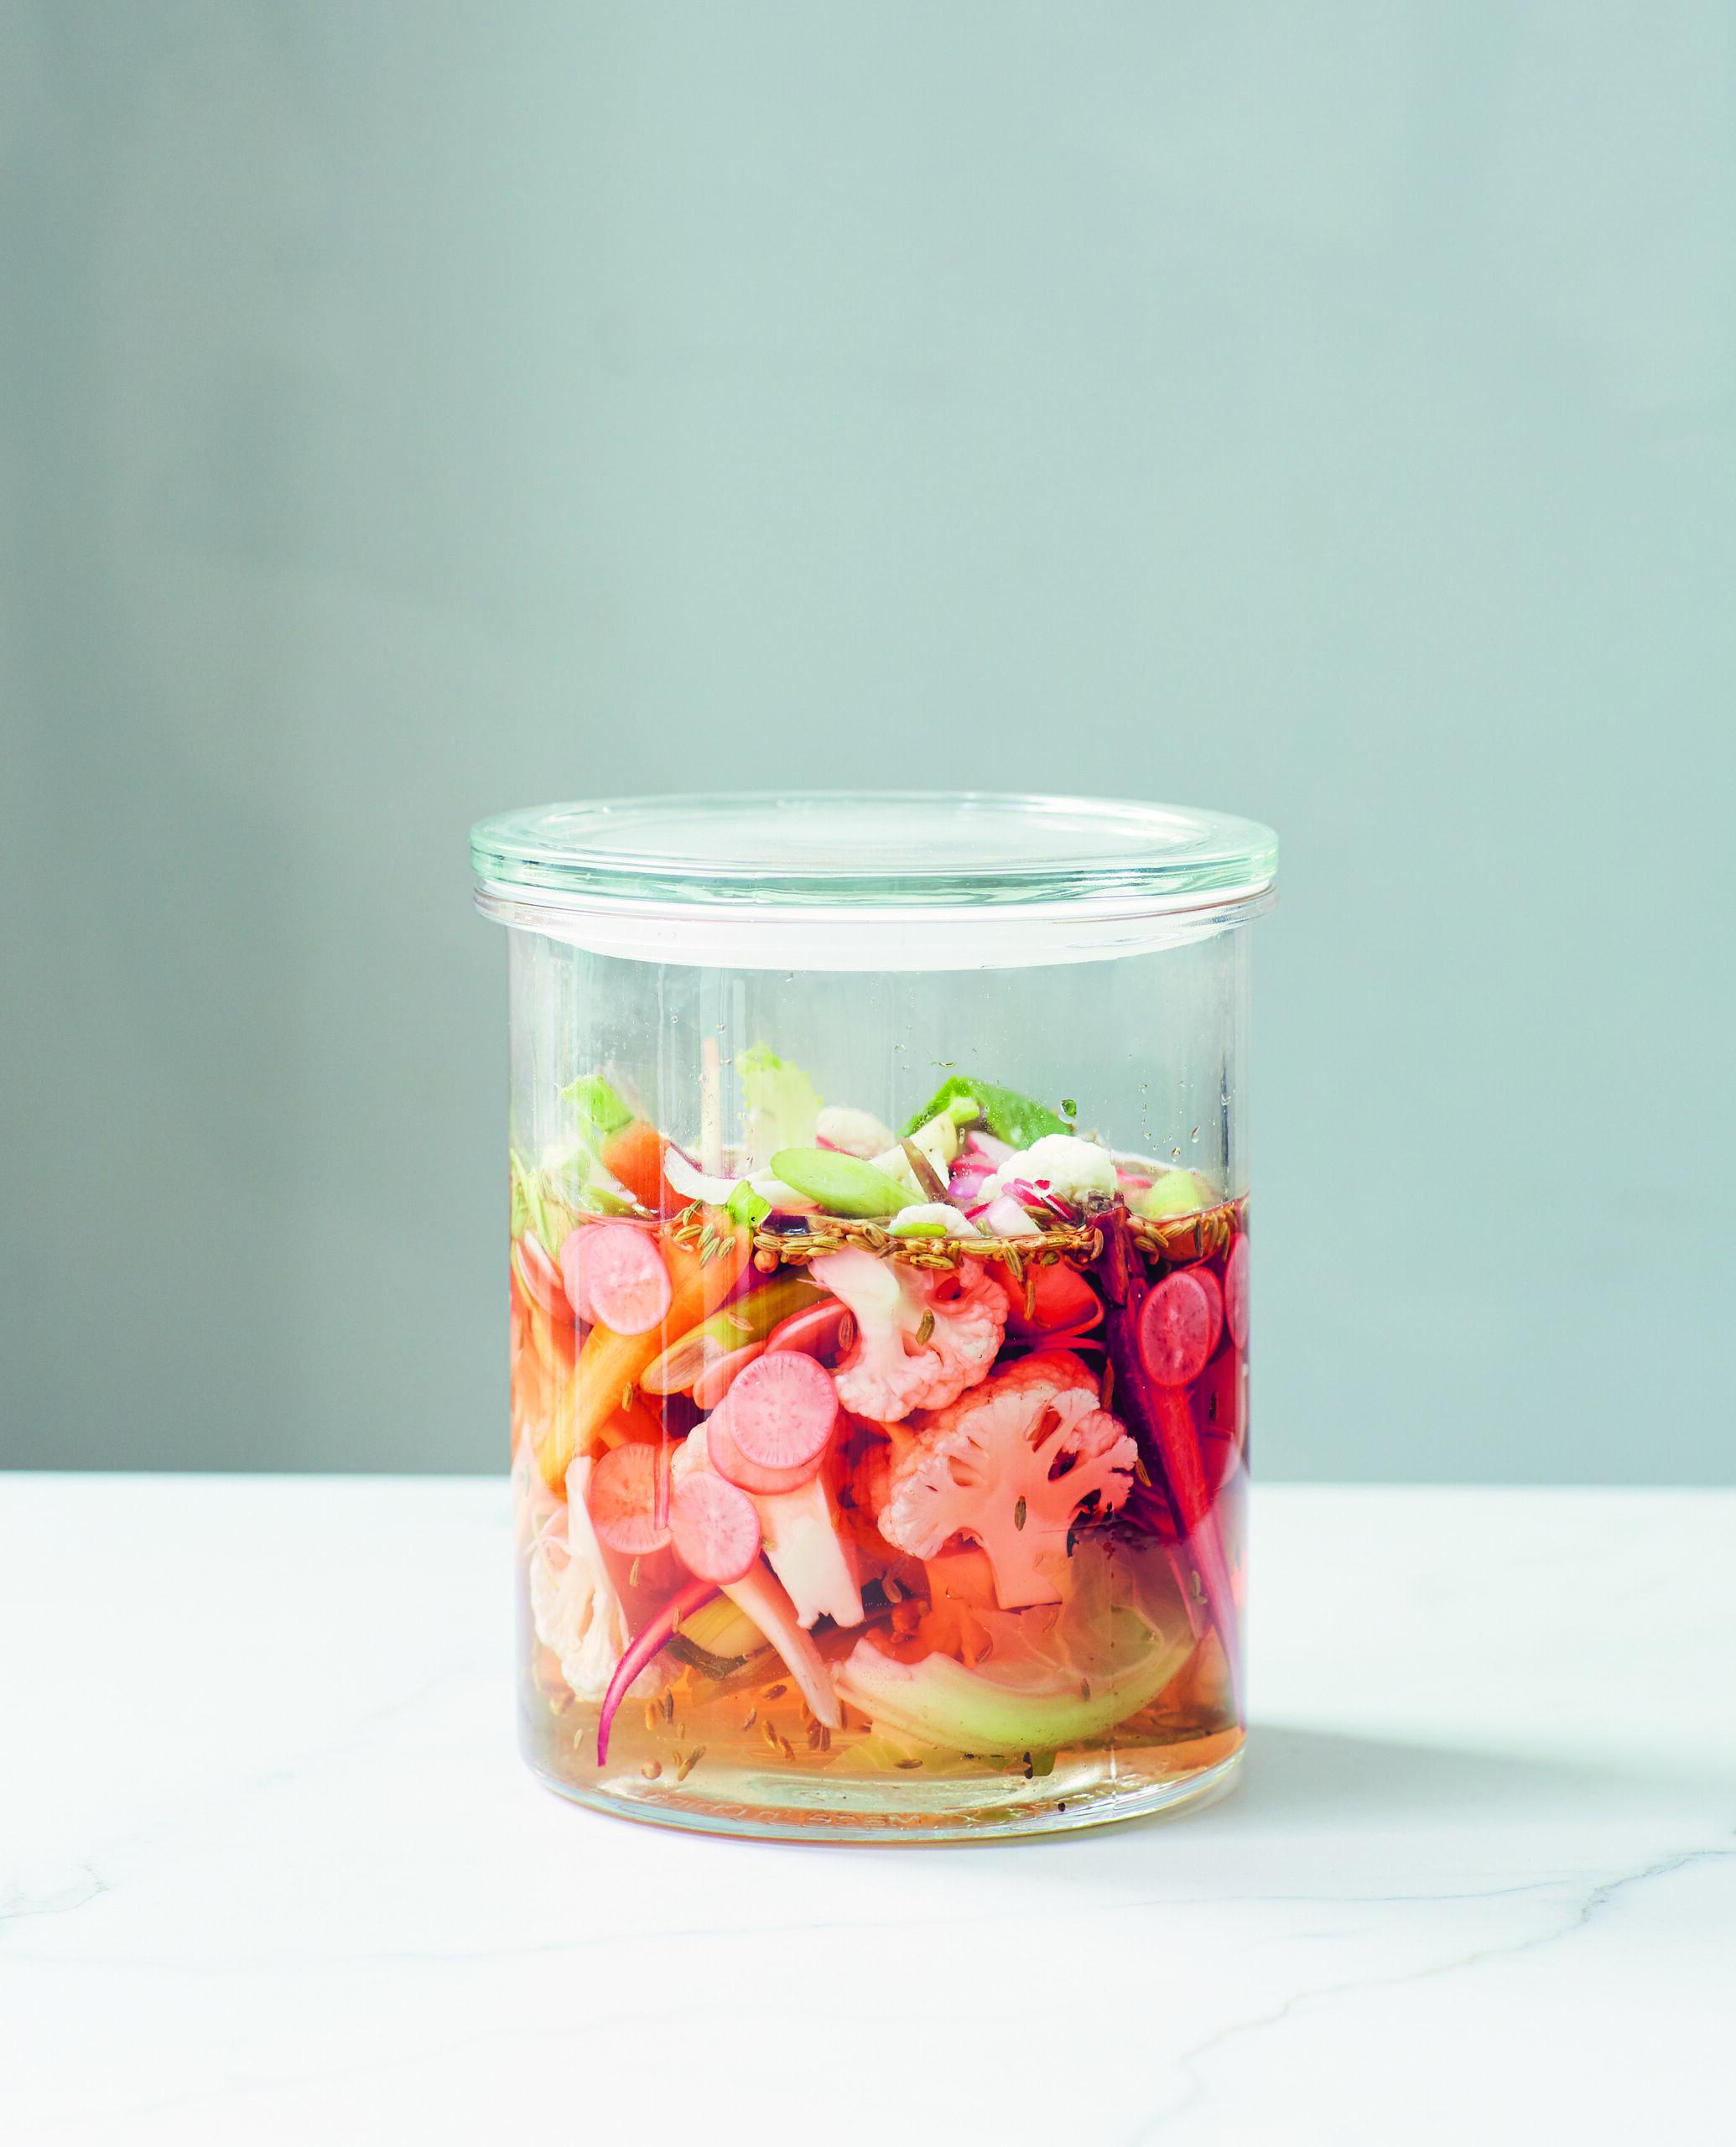 How to Make Primörer, Swedish Preserved Vegetables - HelloVeggie.co